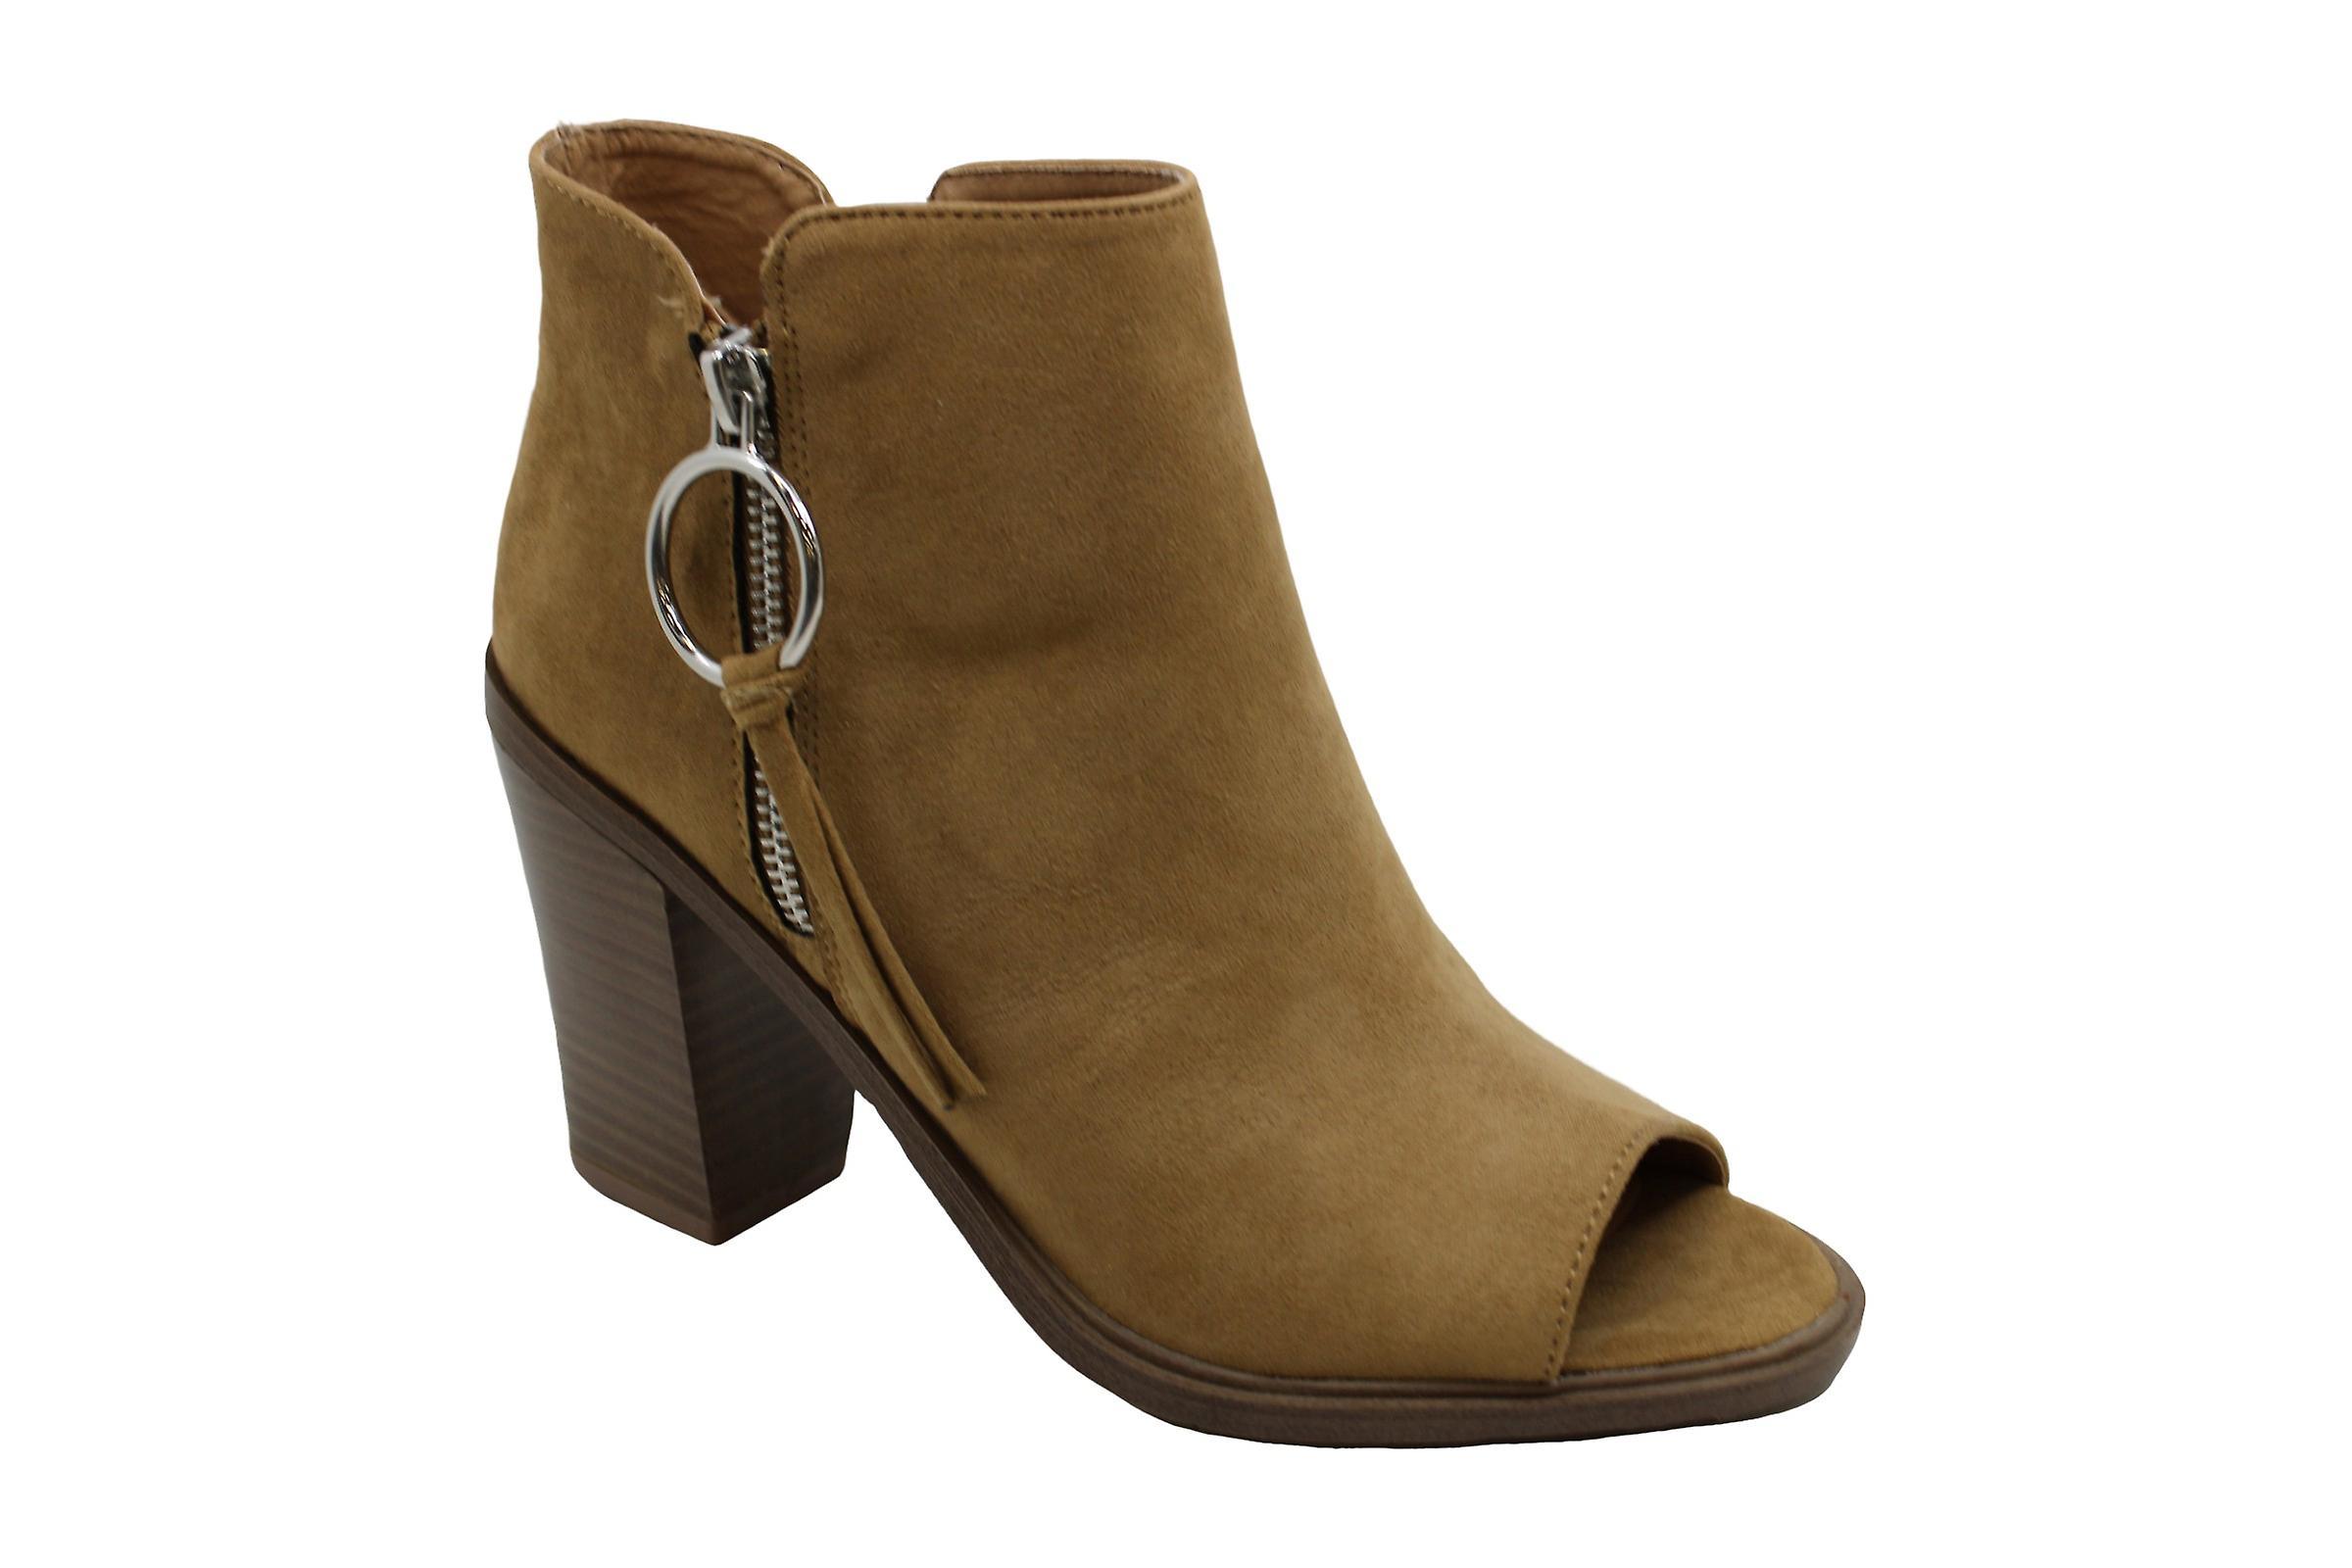 Esprit Women-apos;s Pump, Bootie, Open Toe, Taille Zip Fashion Boot  S2PzQf